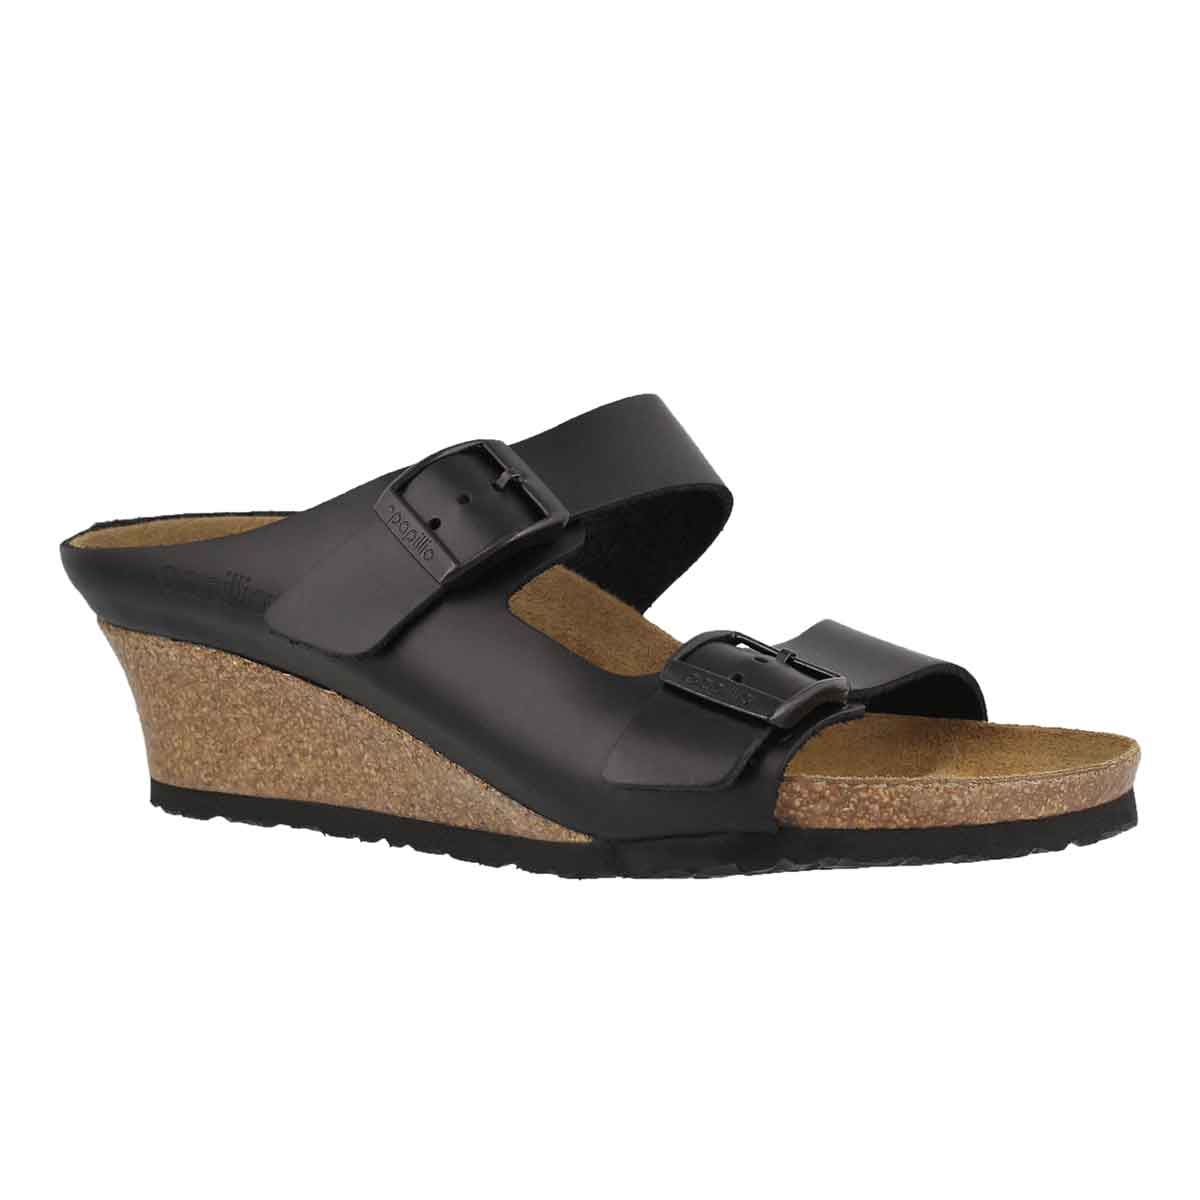 Women's EMINA LTR black wedge sandals - Narrow